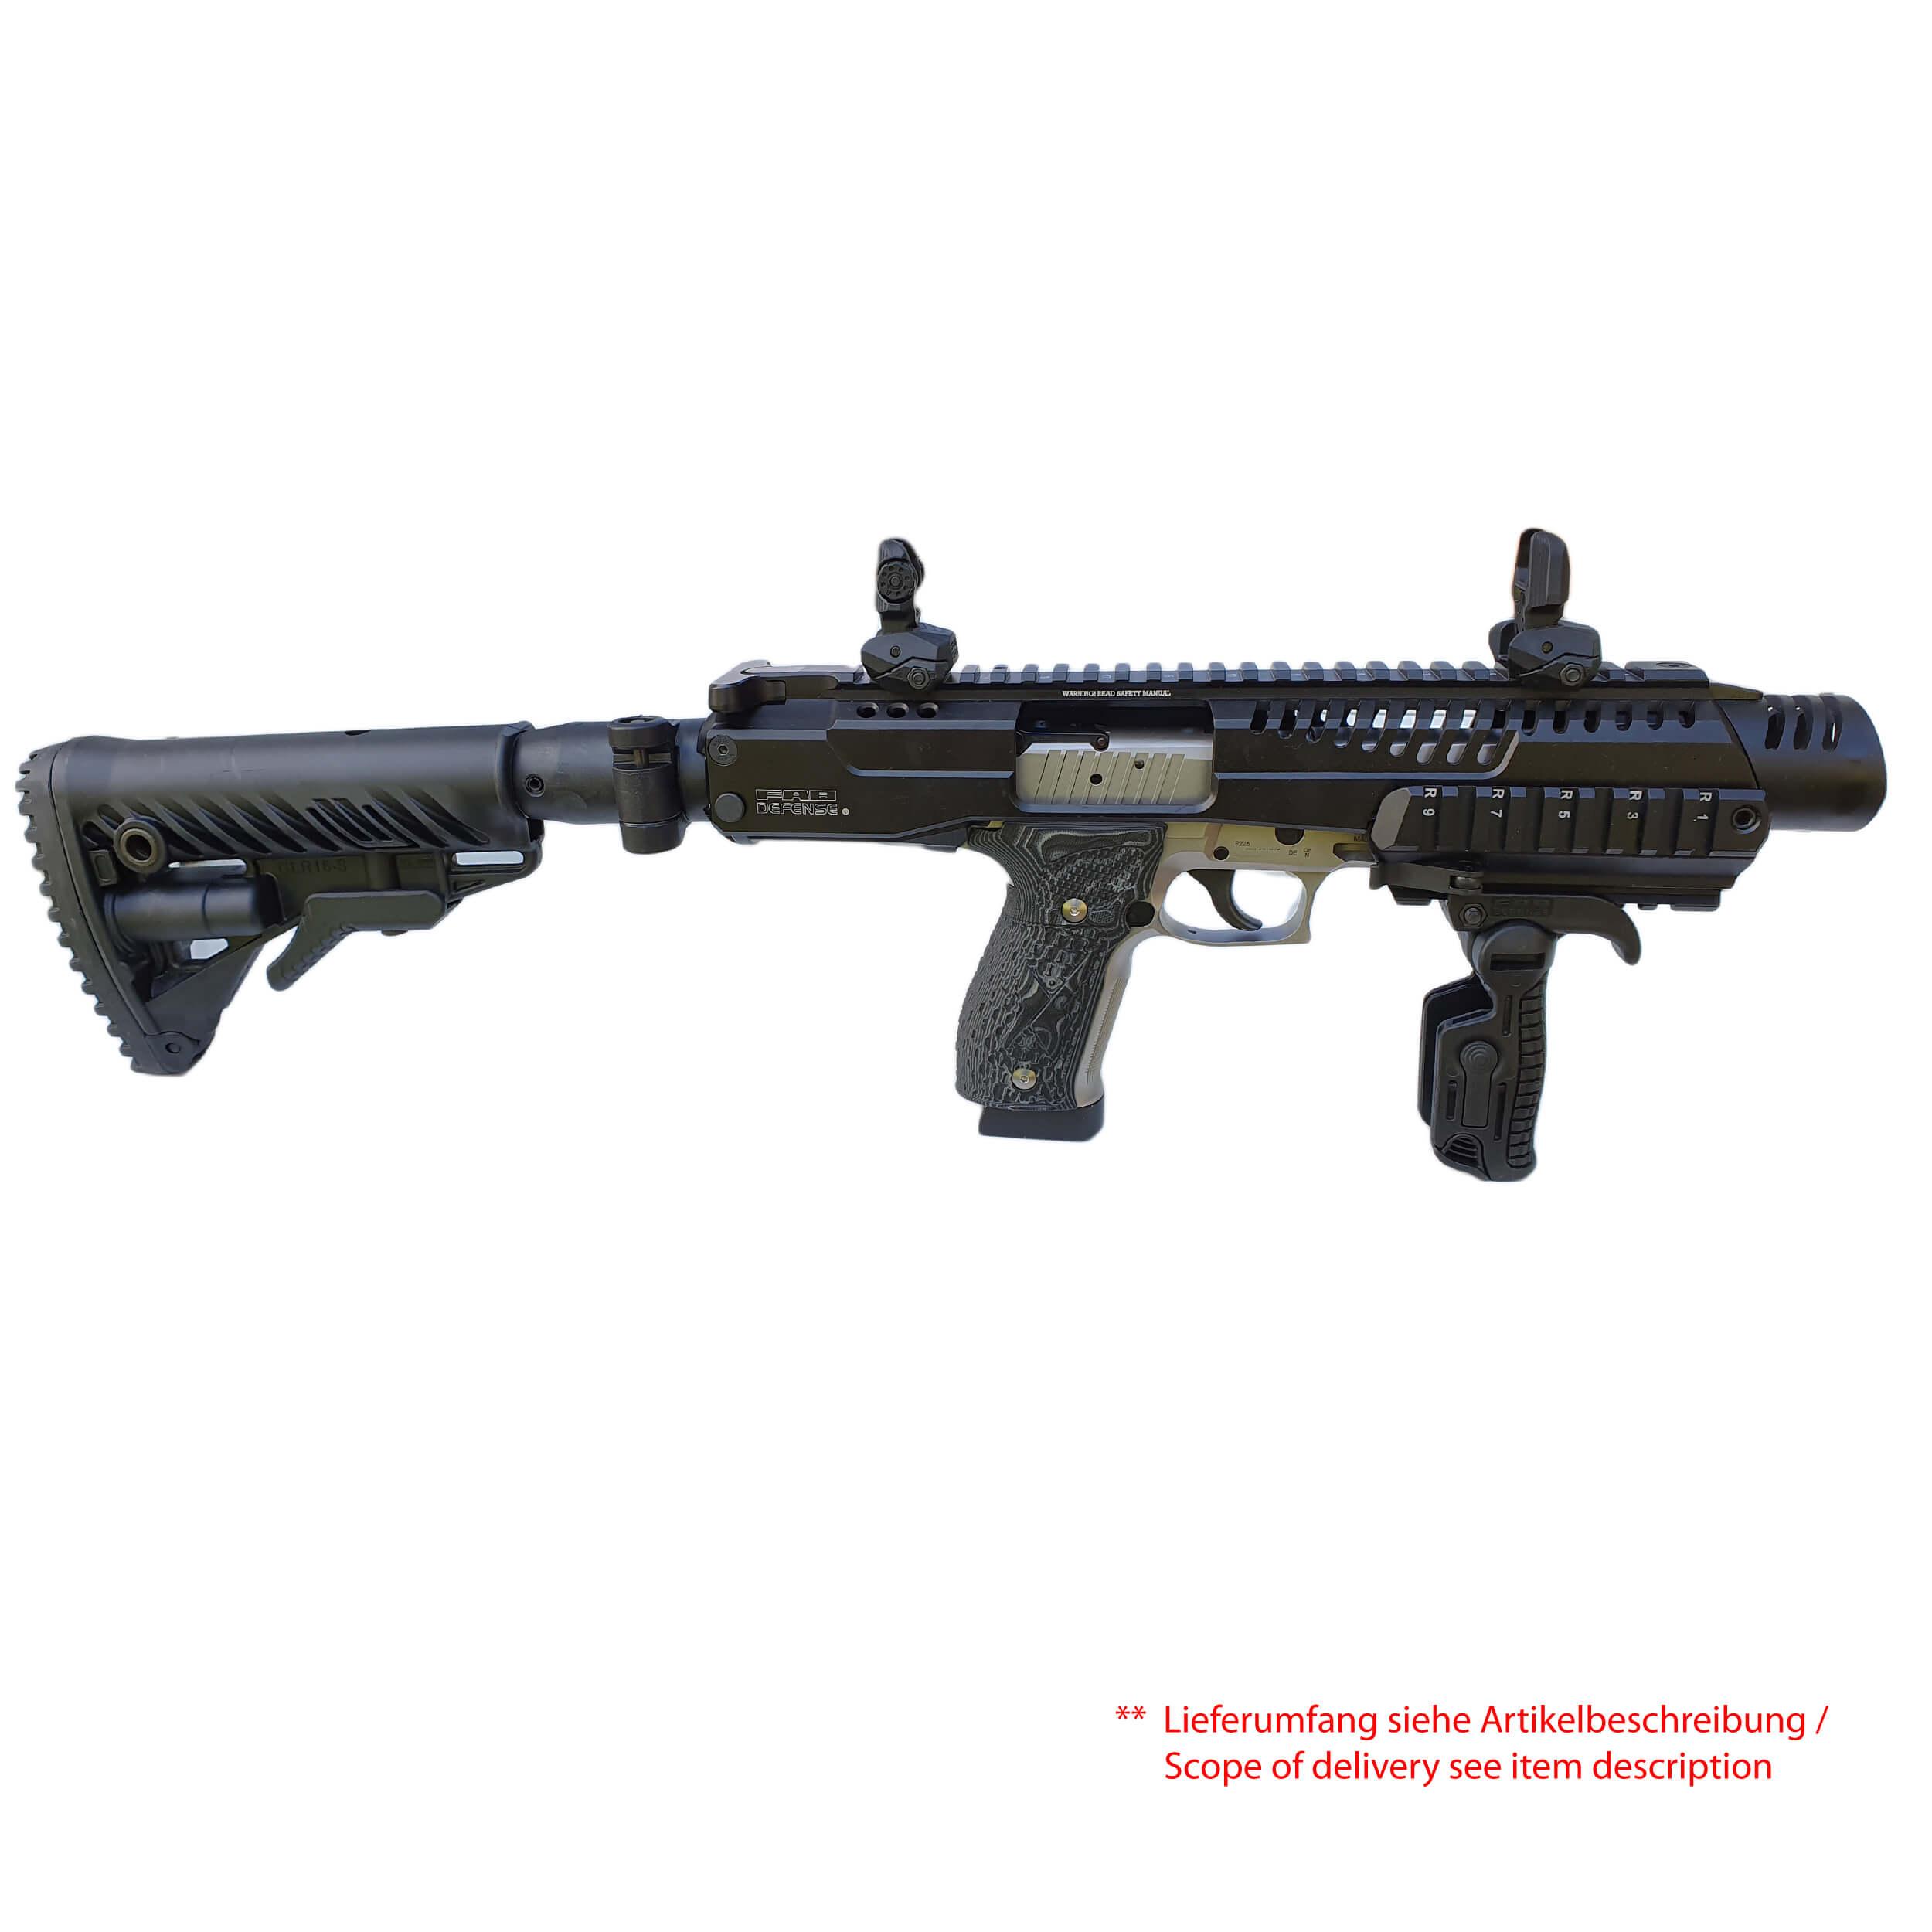 KPOS G2C Sig Sauer P226/220 X-SIX